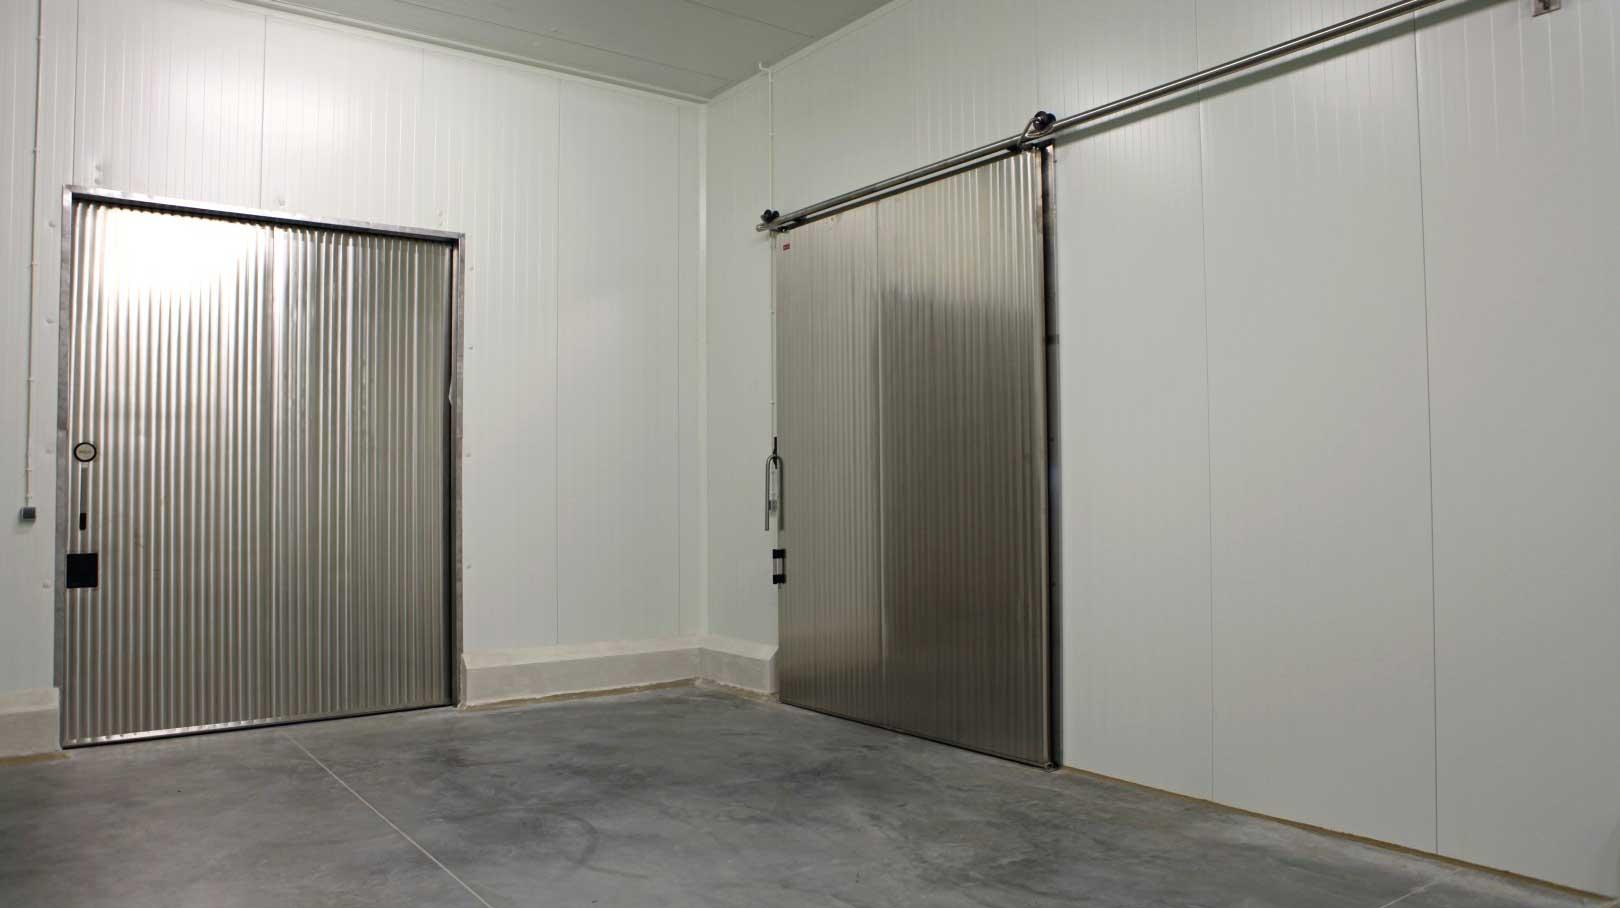 New Range - Stainless Steel Doors